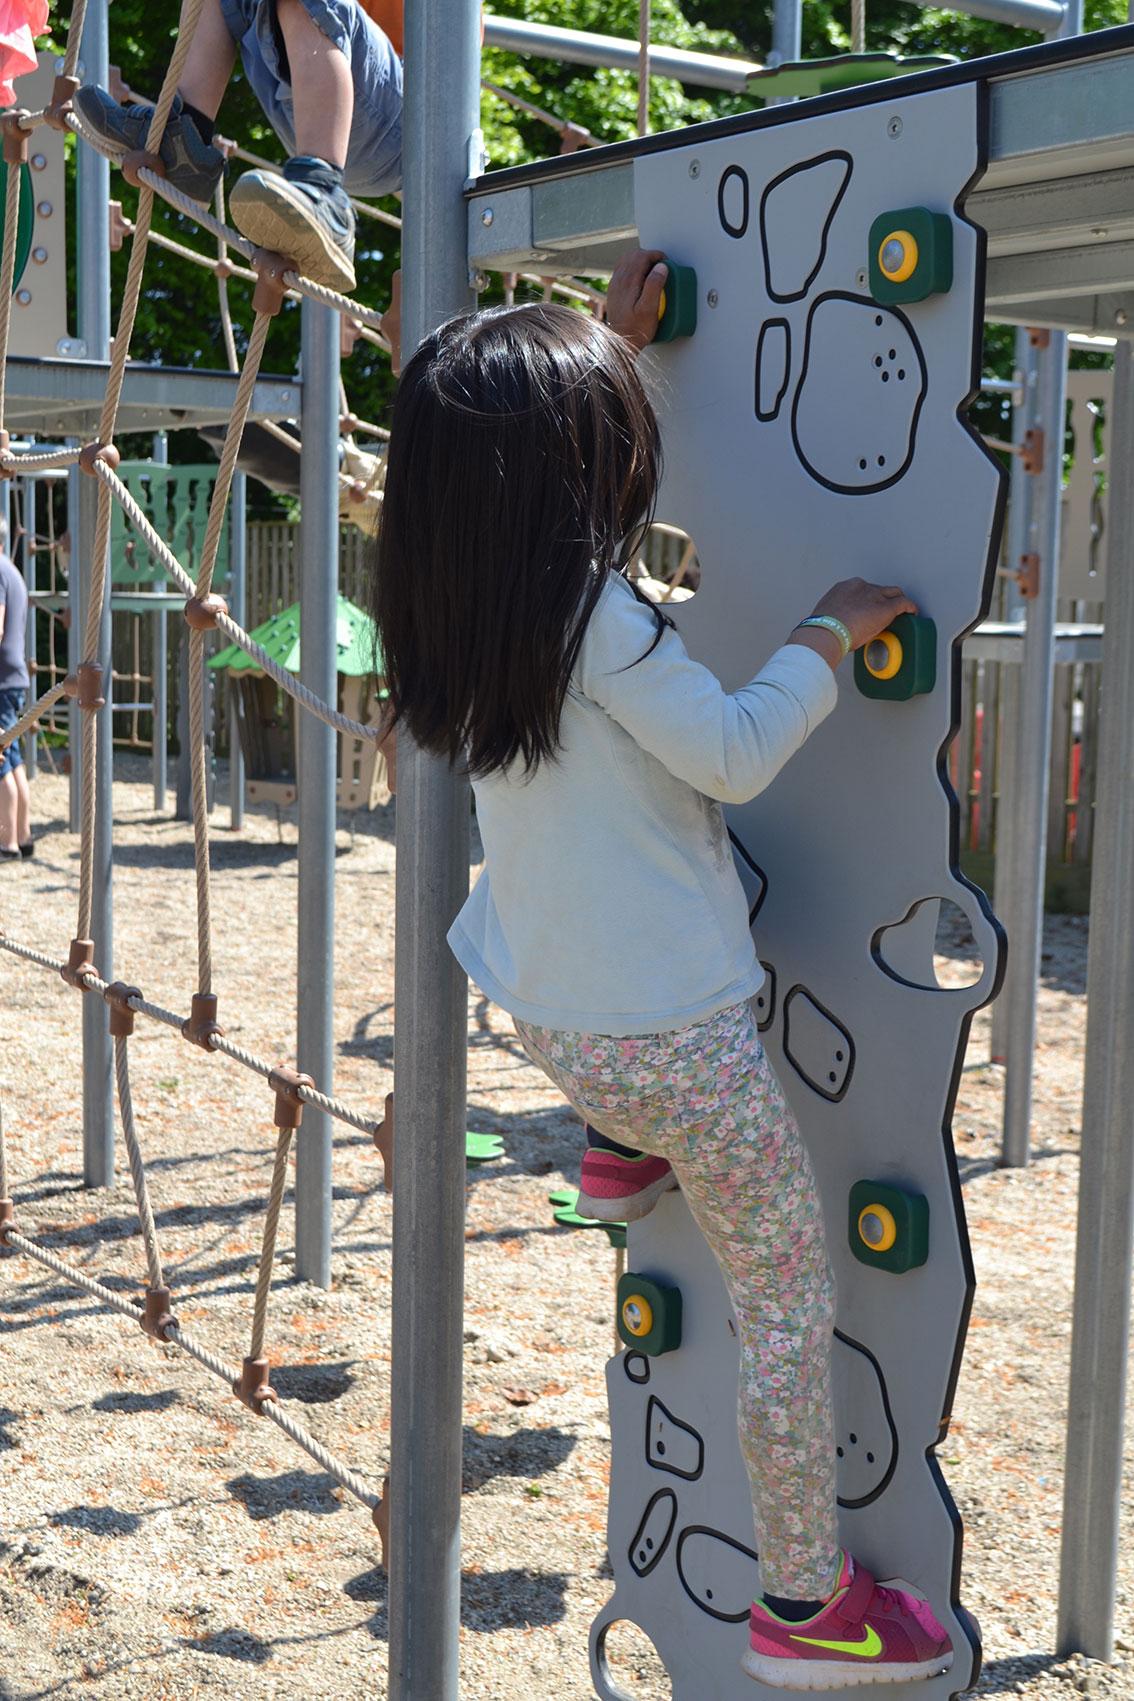 climbing-equipments-for-kids.jpg